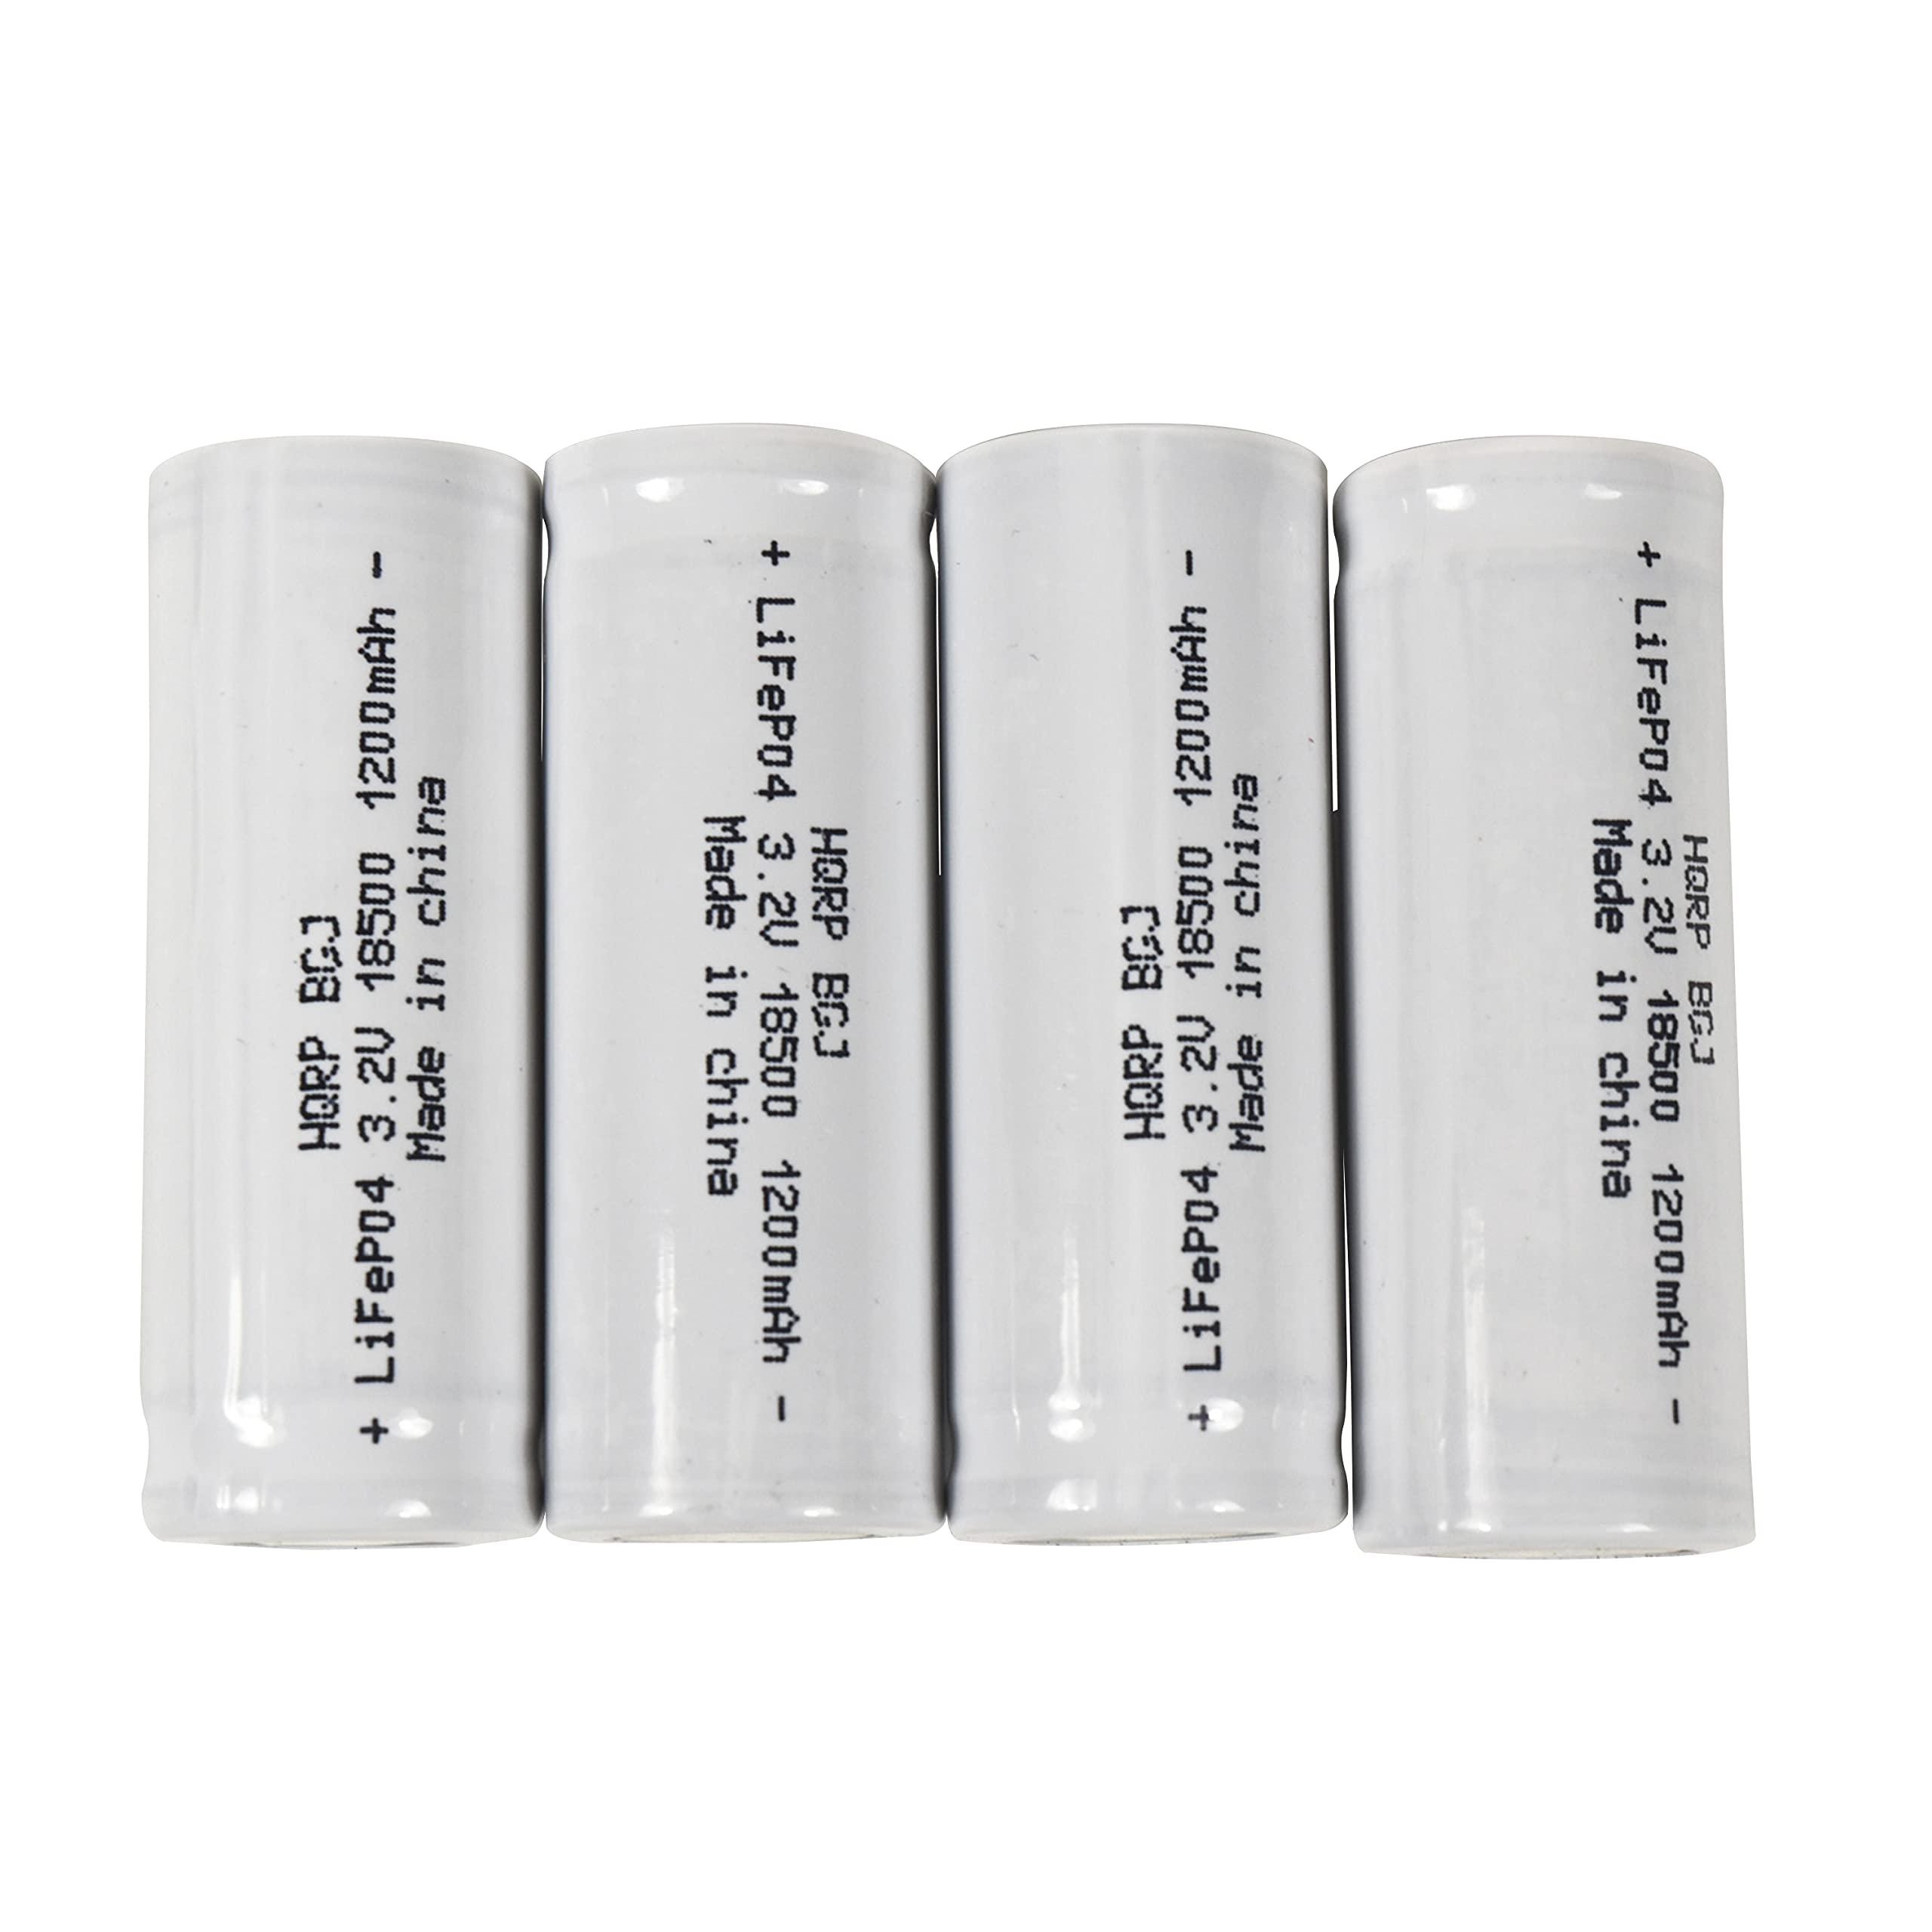 4 Bateria P/ Solar Garden Landscape Patio Light IFR-18500